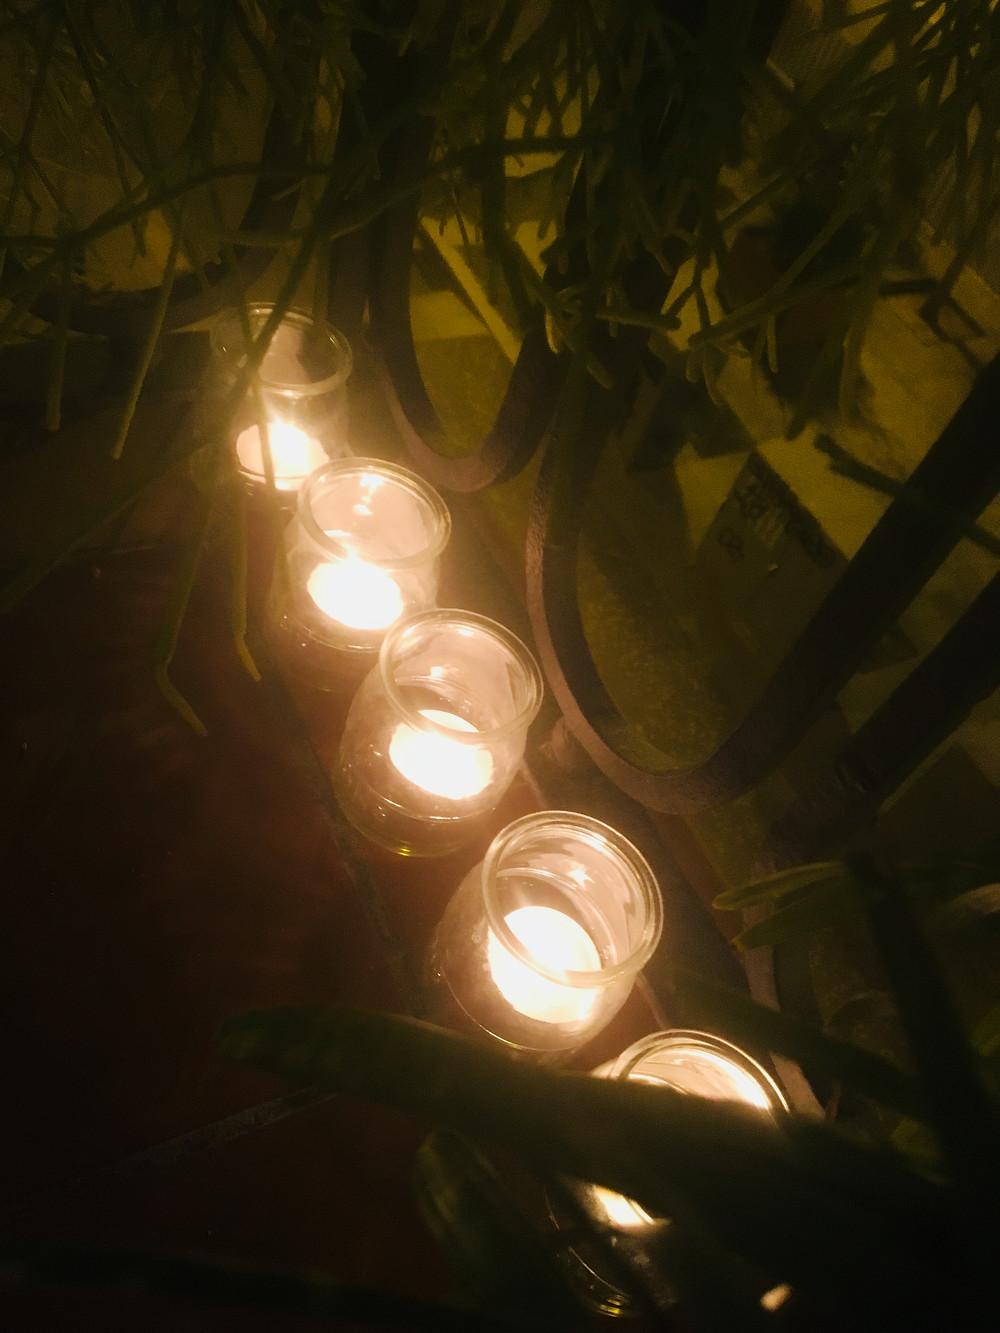 Five candles to mark five days of Coronavirus lockdown in Barcelona